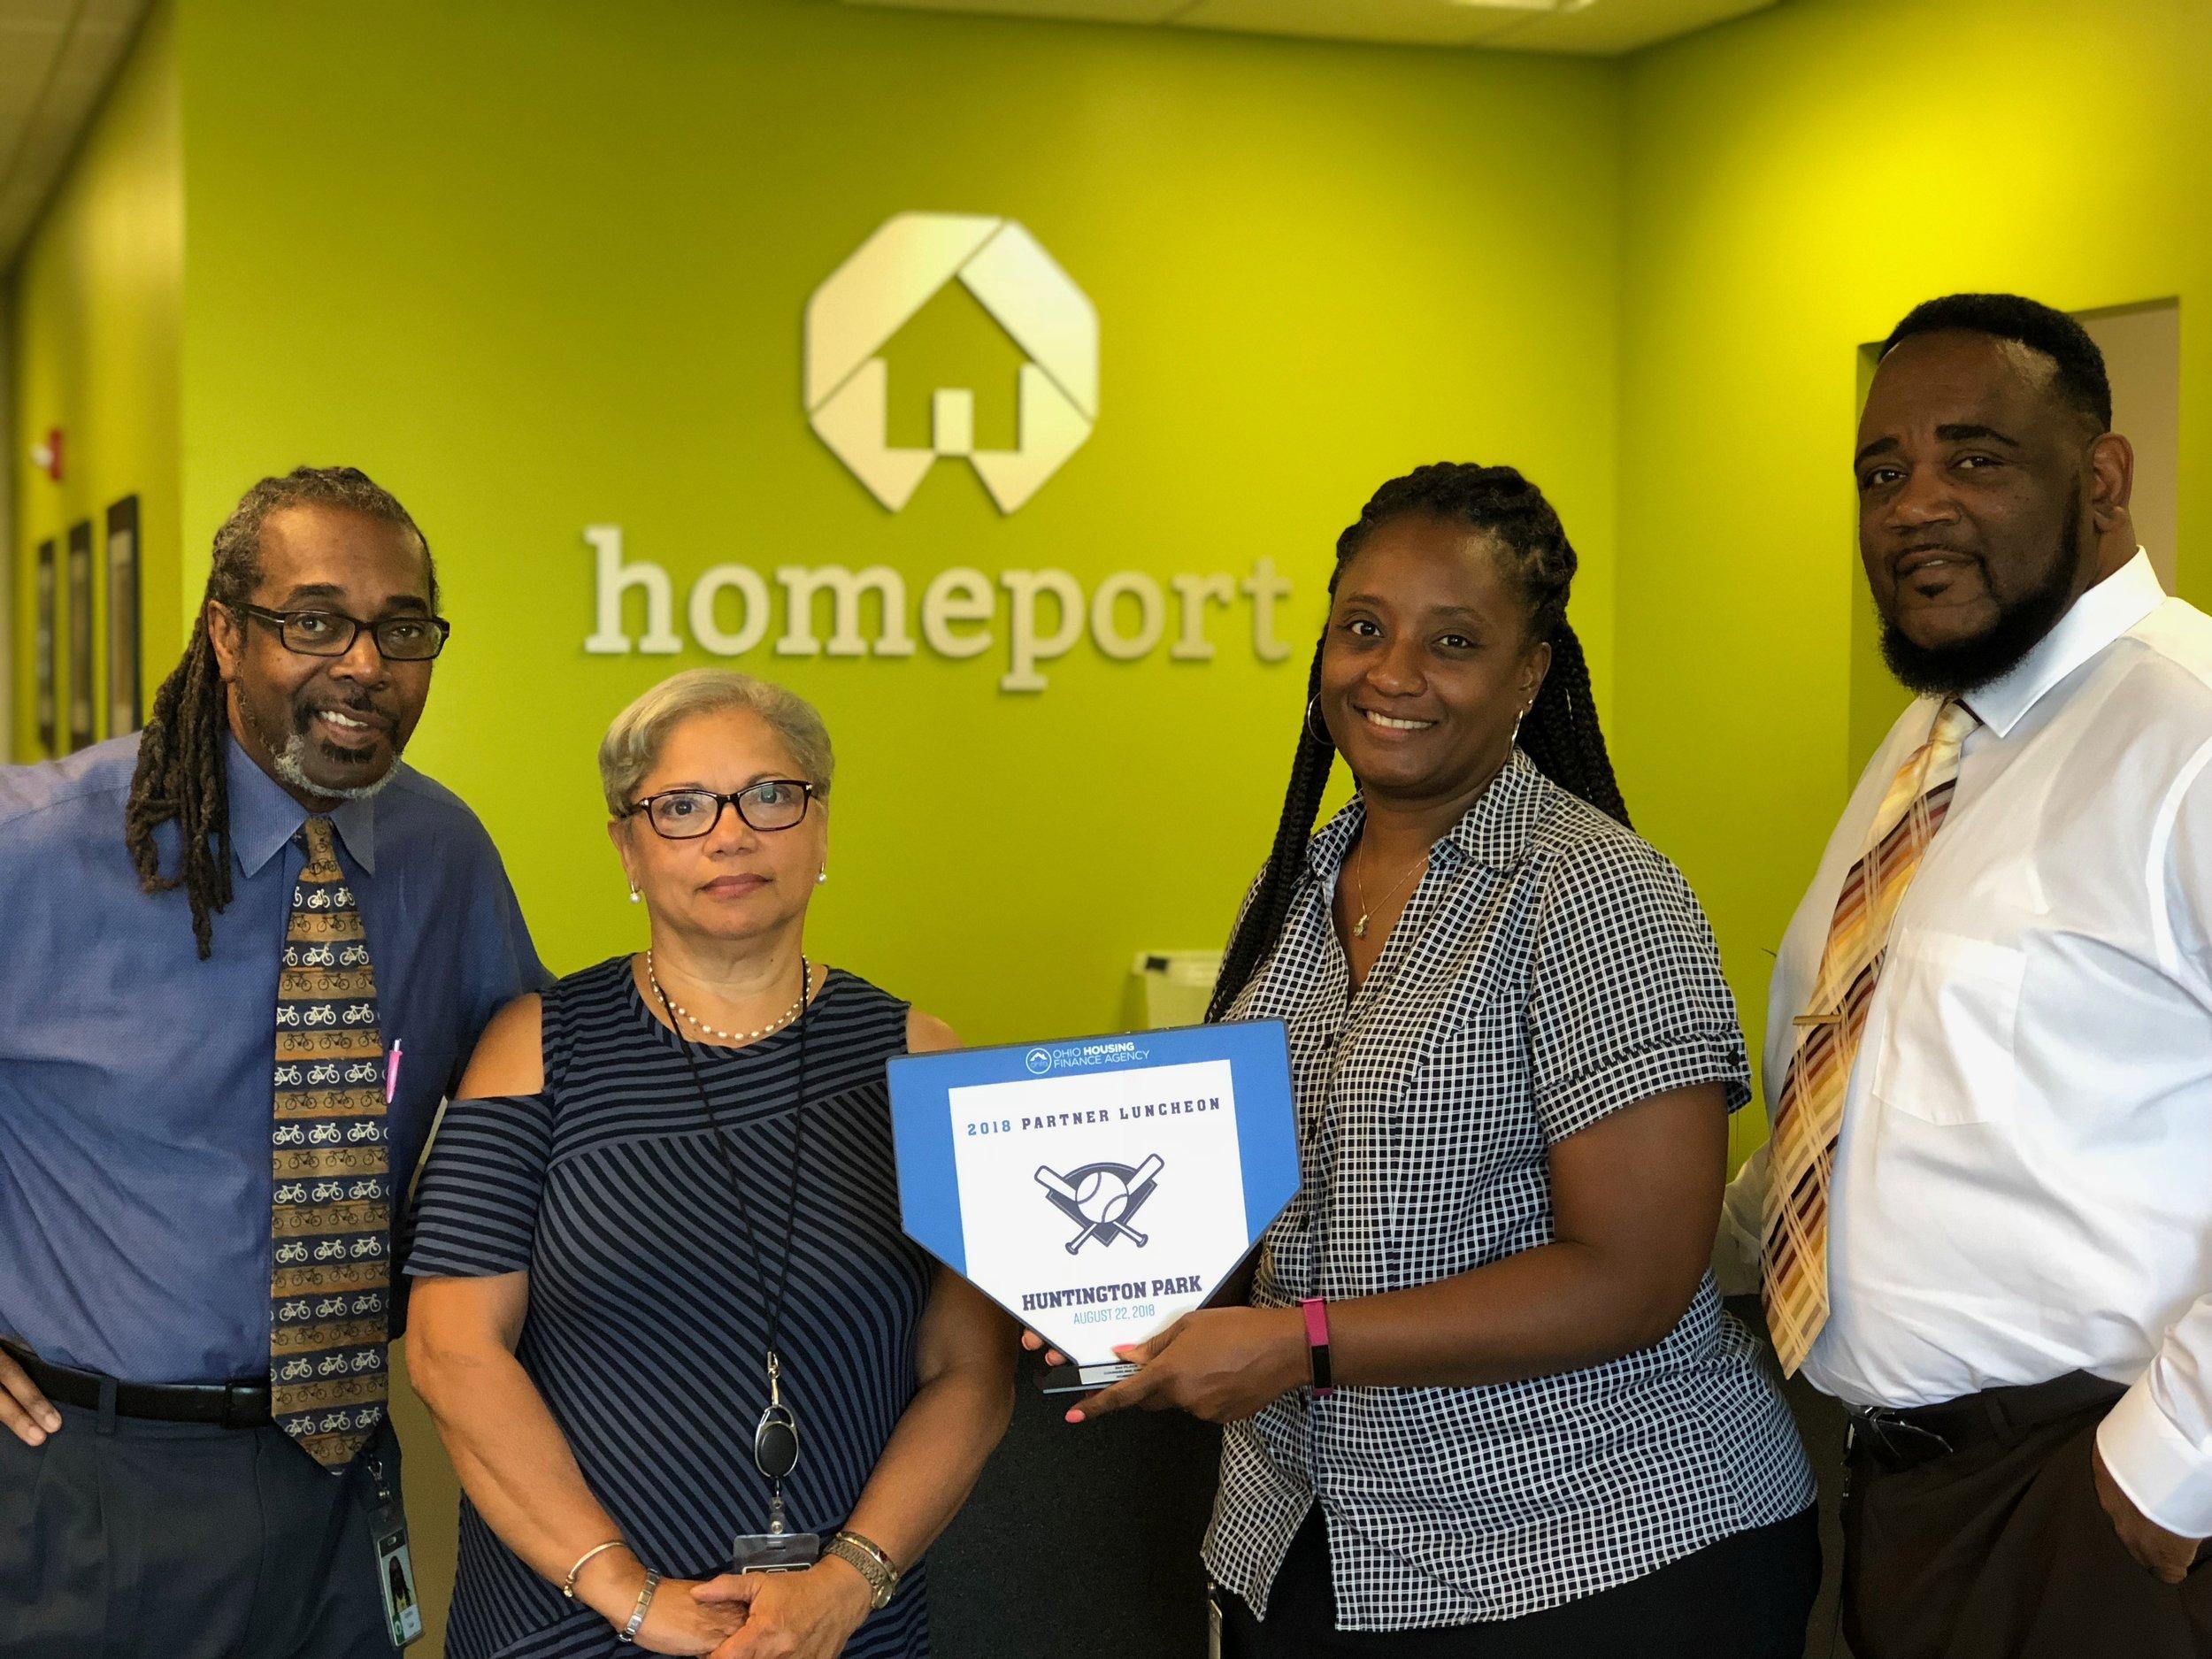 Homeport's Housing Advisory Services' Layden Hale, Isabel Giles, Netta Whitman and Kerrick Jackson.